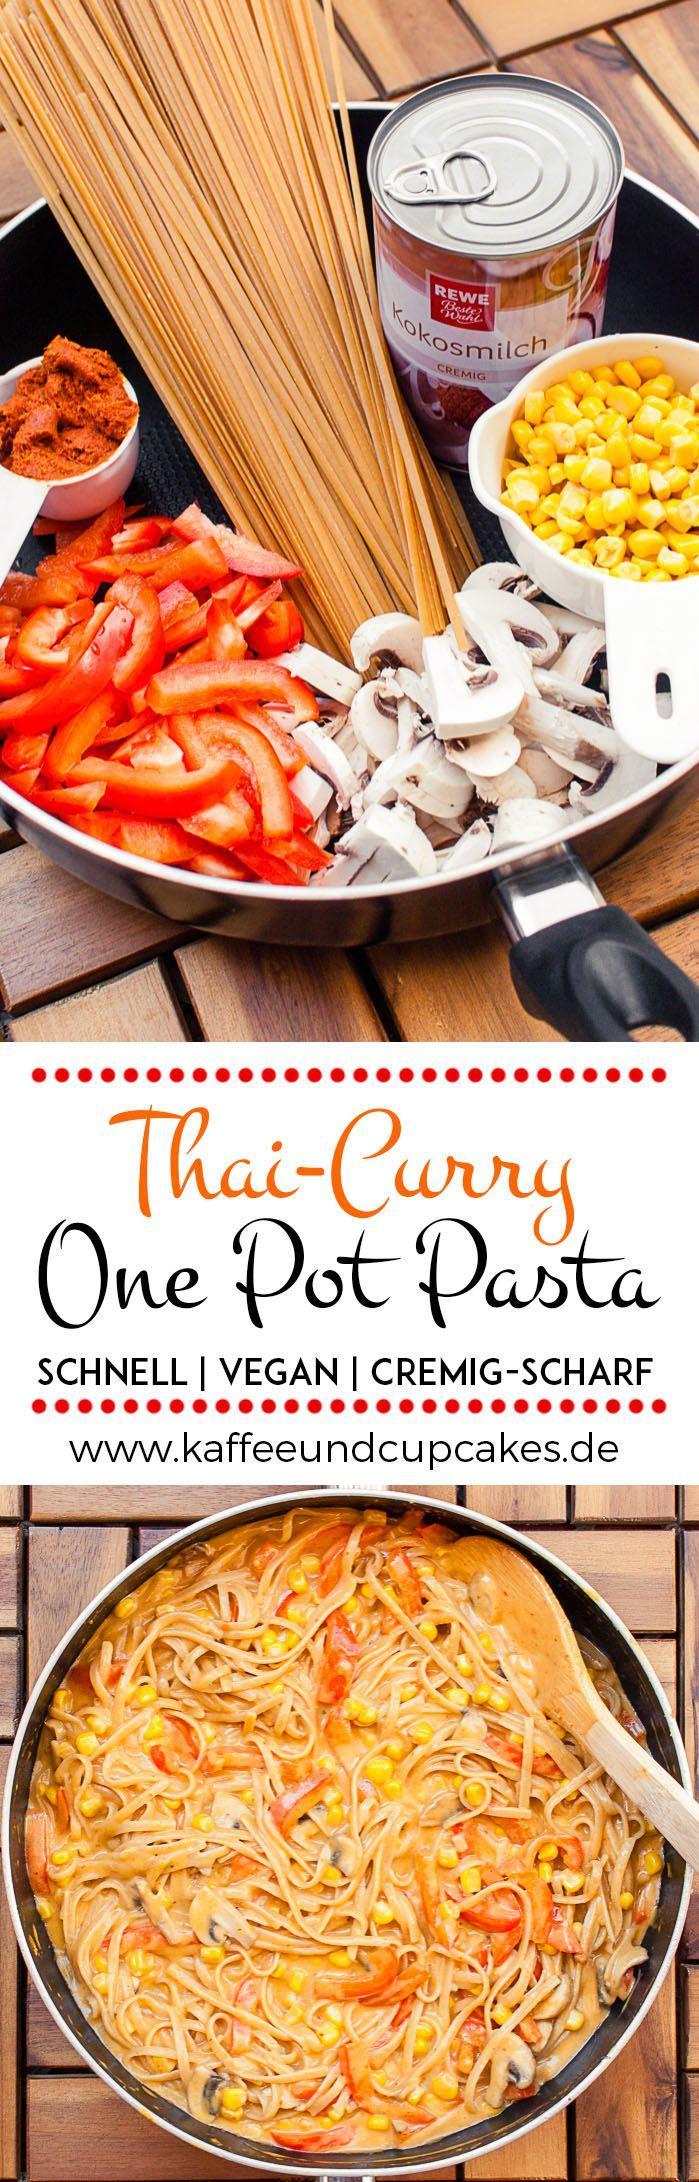 Cremig-scharfe Thai-Curry One Pot Pasta (vegan) #chickenalfredo